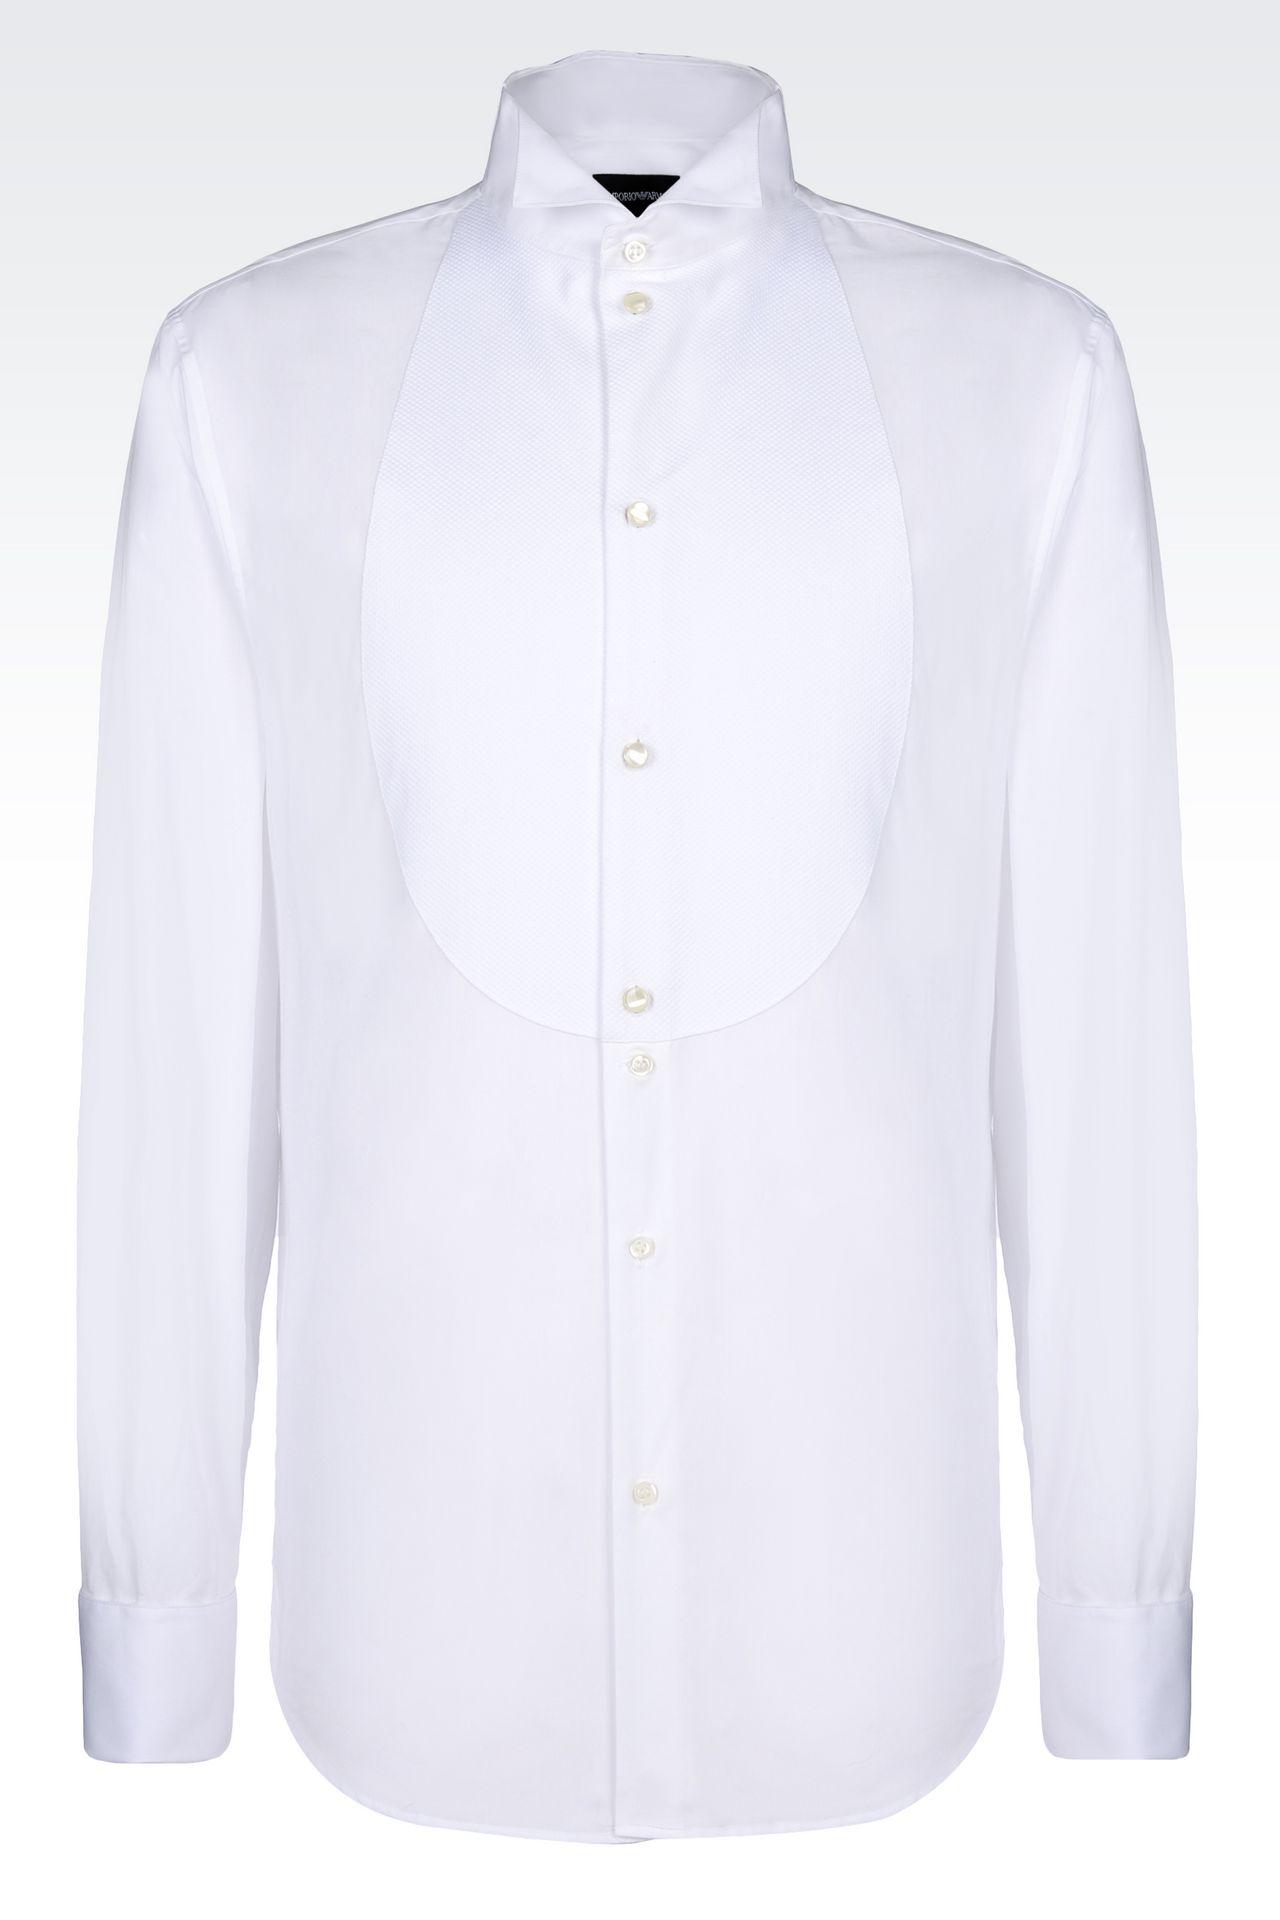 9e6c89a01da armani shirts price list sale   OFF44% Discounts